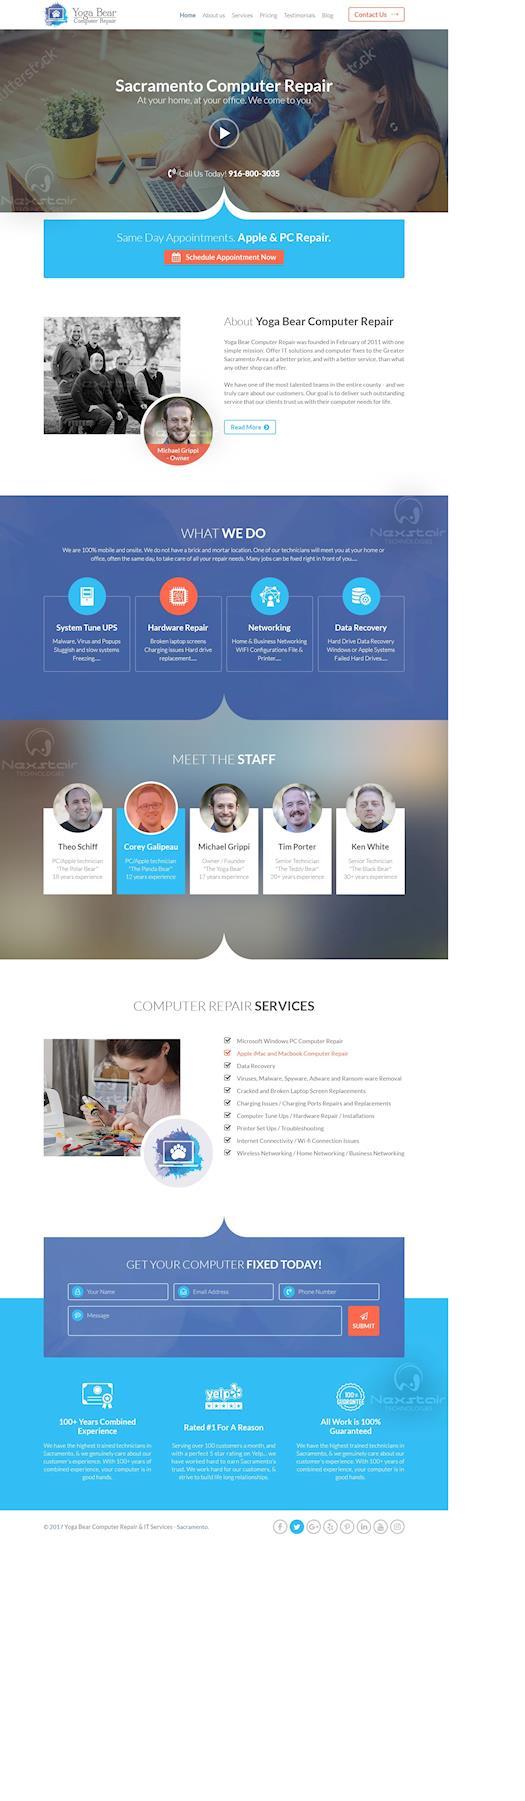 computer repair website template design by Nexstair